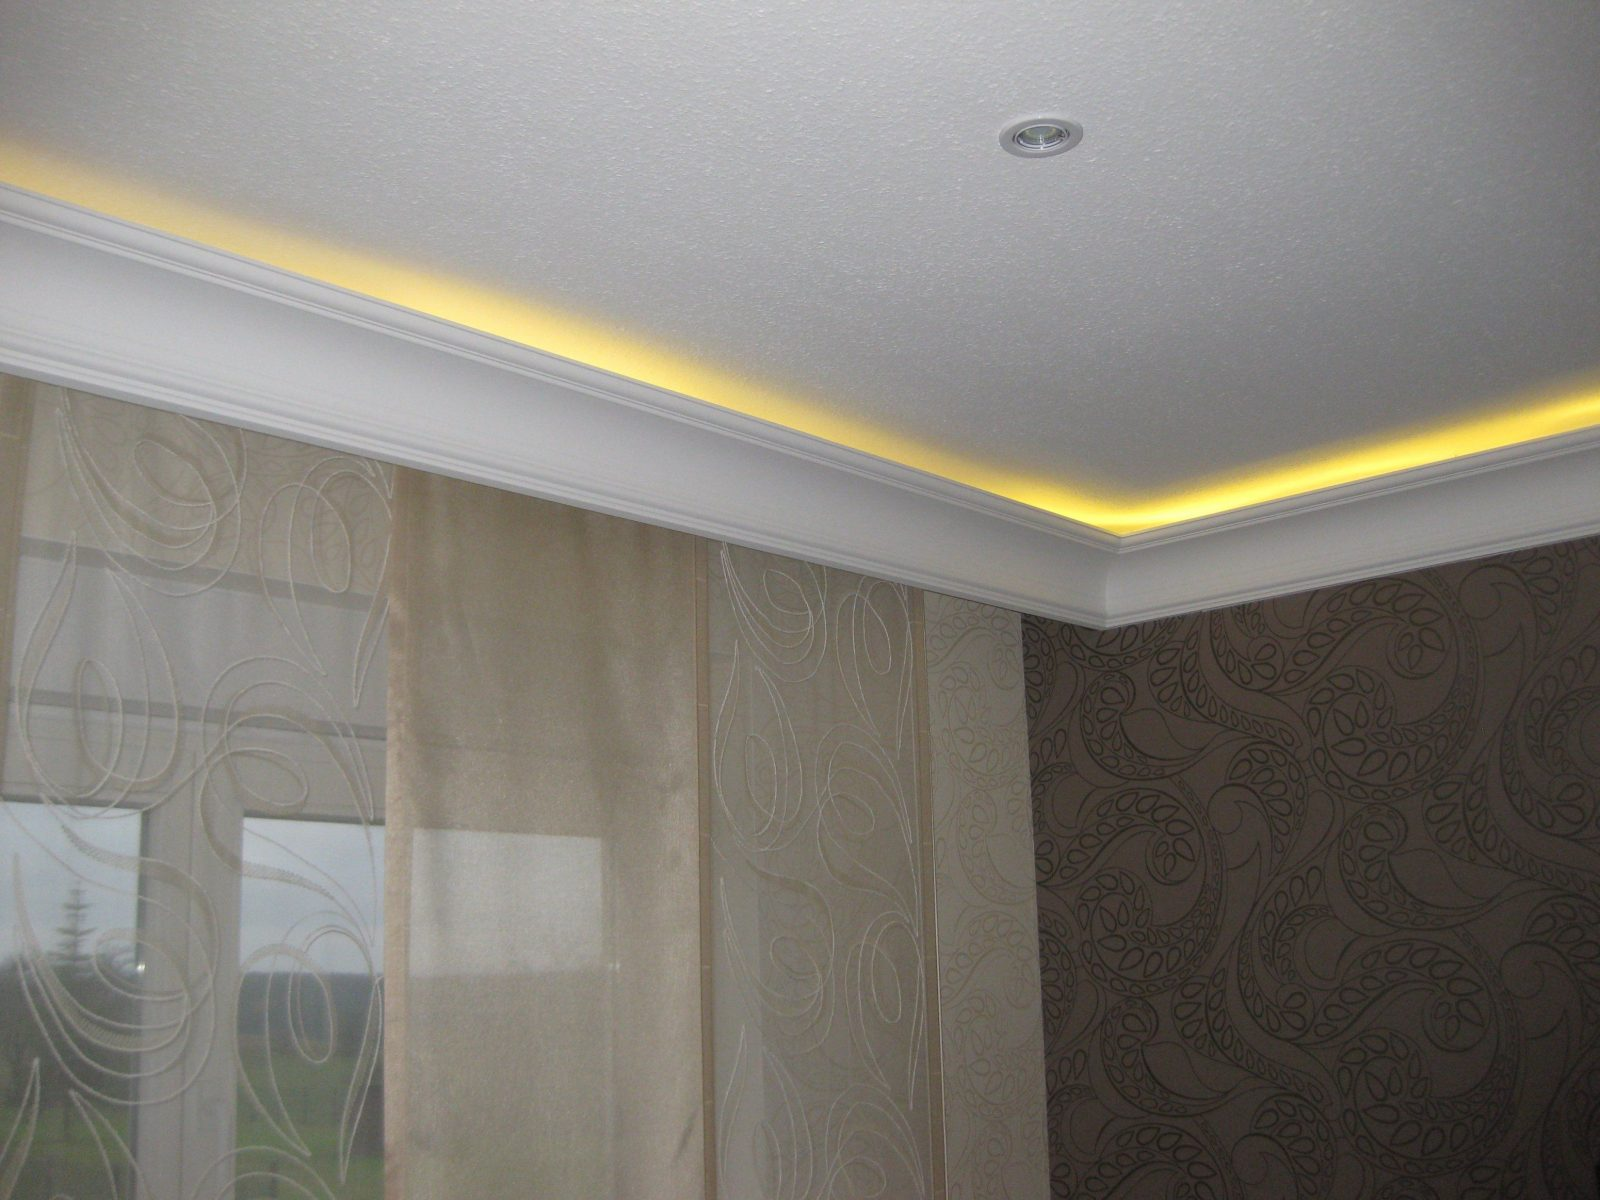 stuck mit indirekter beleuchtung haus design ideen. Black Bedroom Furniture Sets. Home Design Ideas